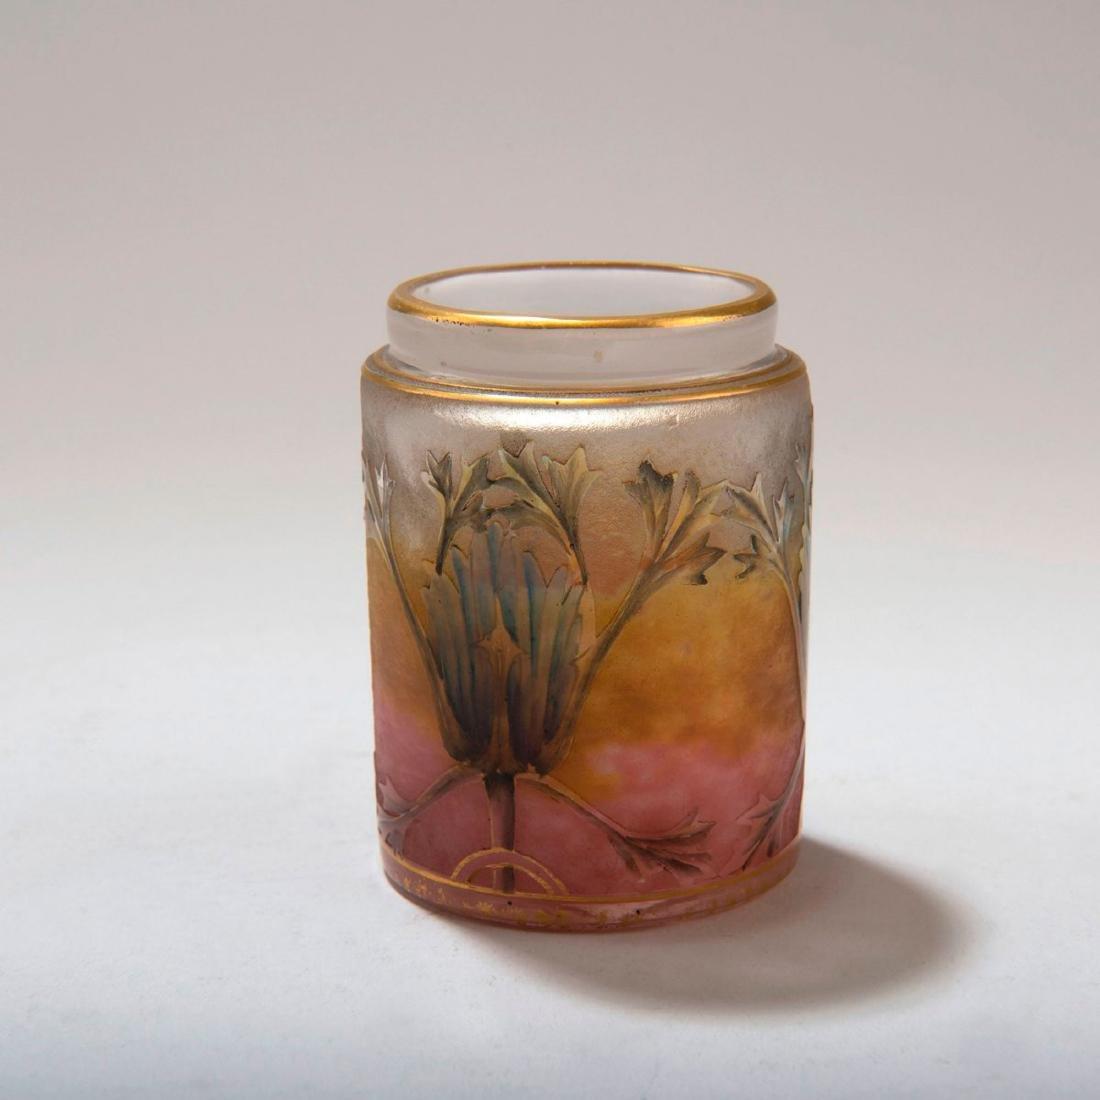 Small 'Chardons' jar, c. 1905